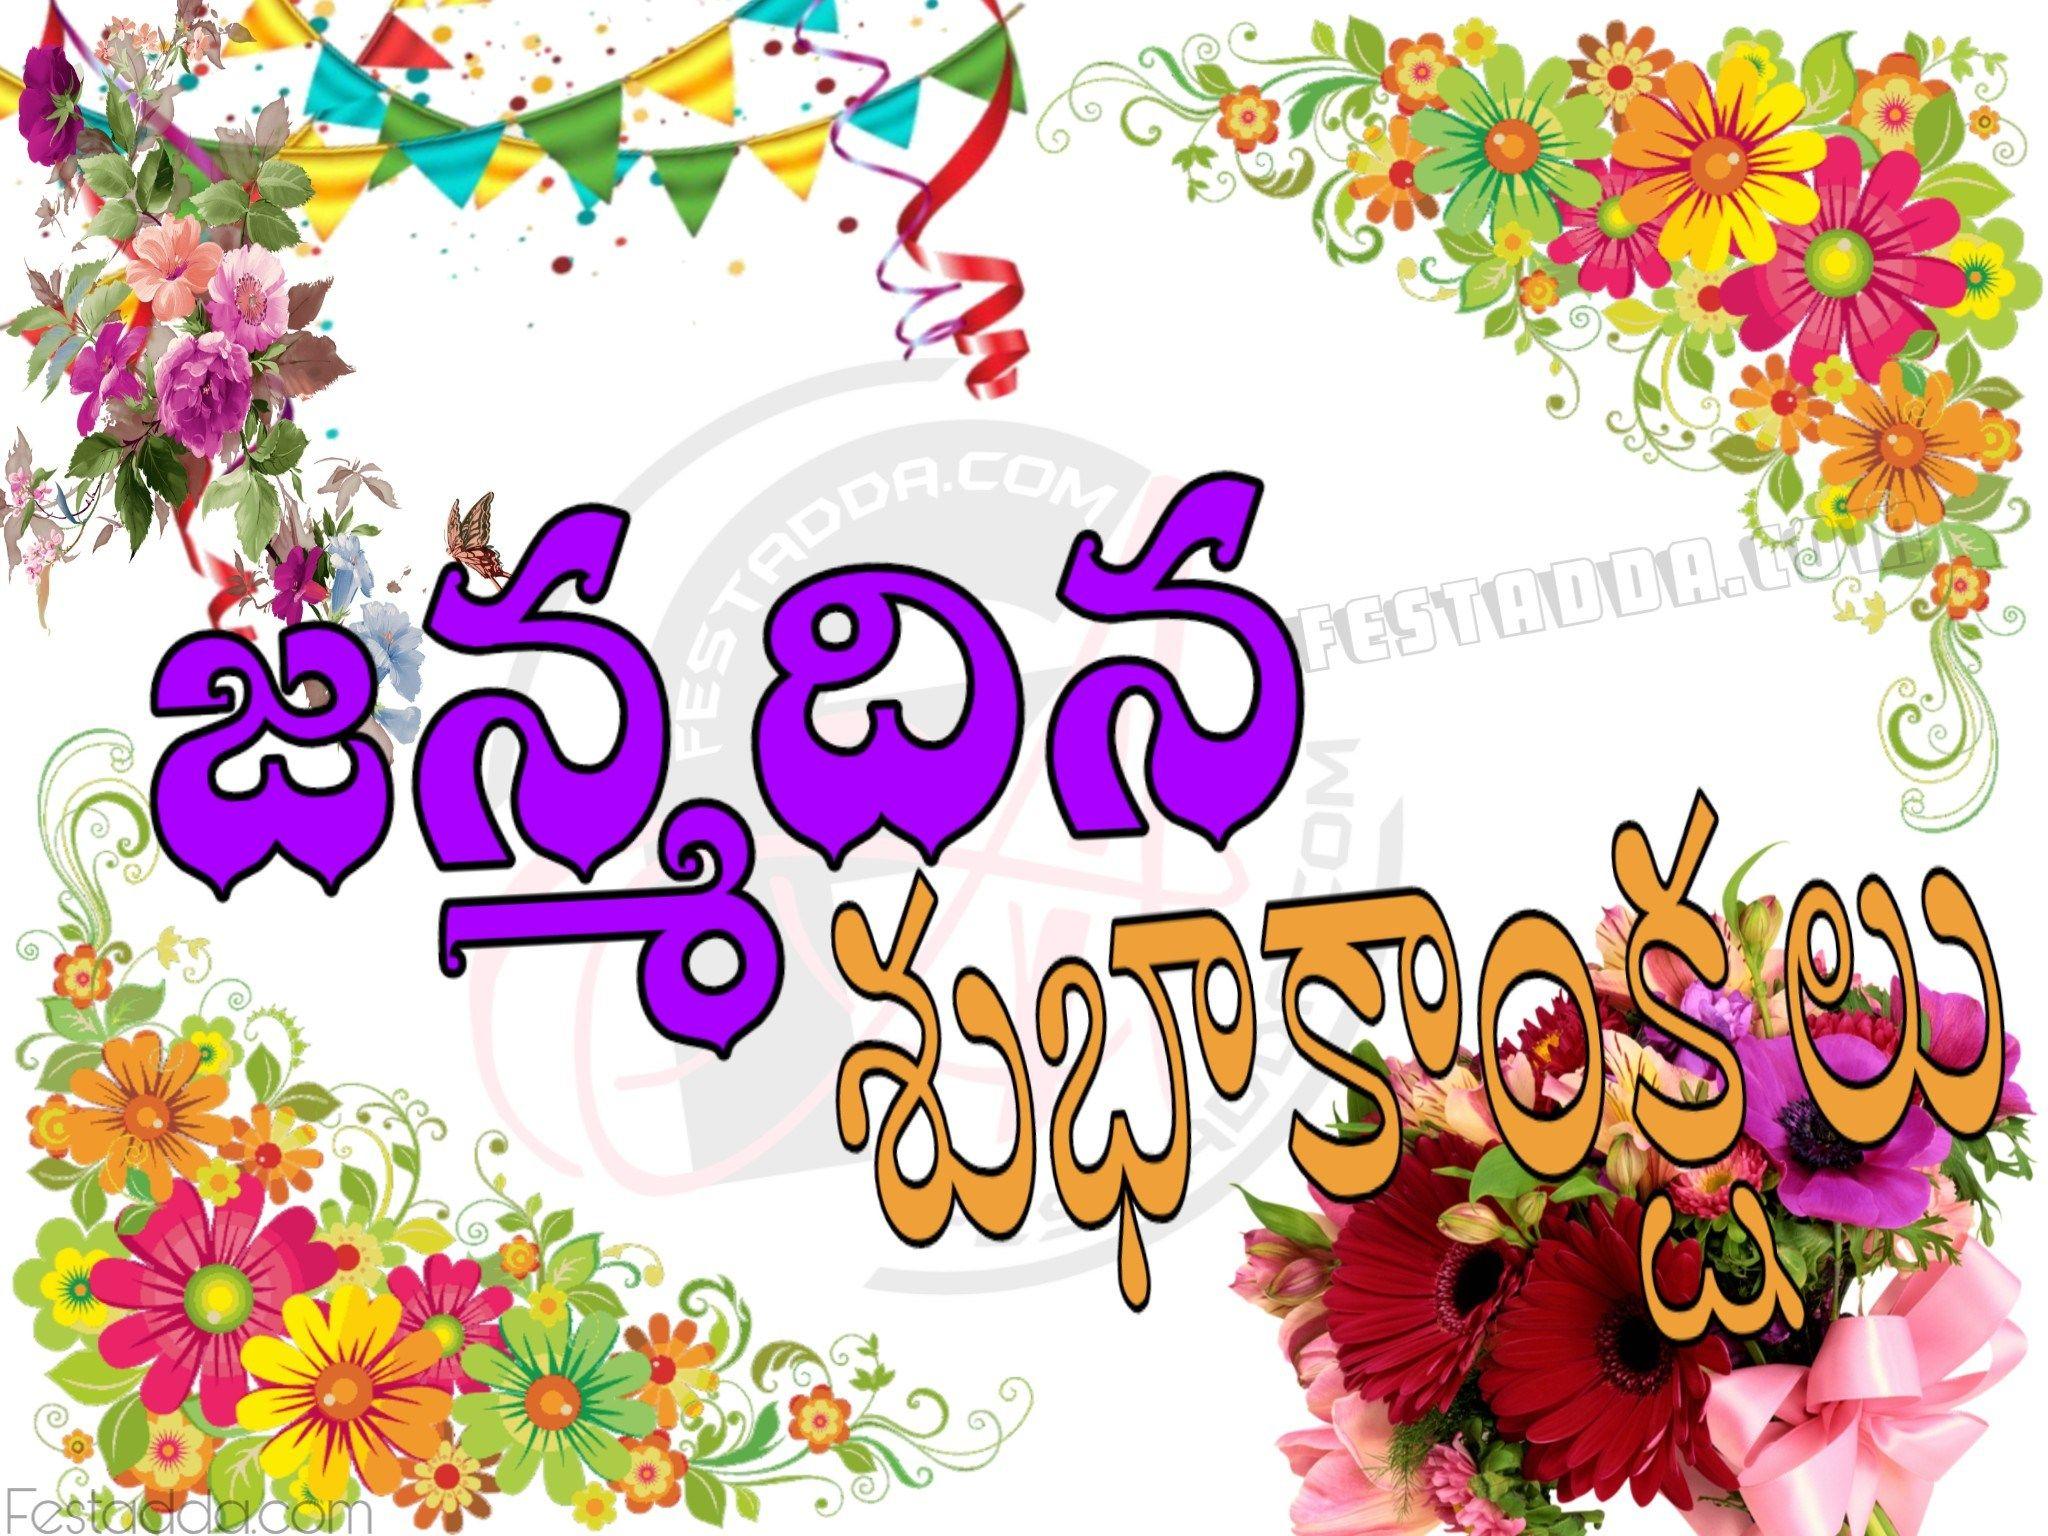 Happy Birthday Wishes in Telugu Font Janmadina